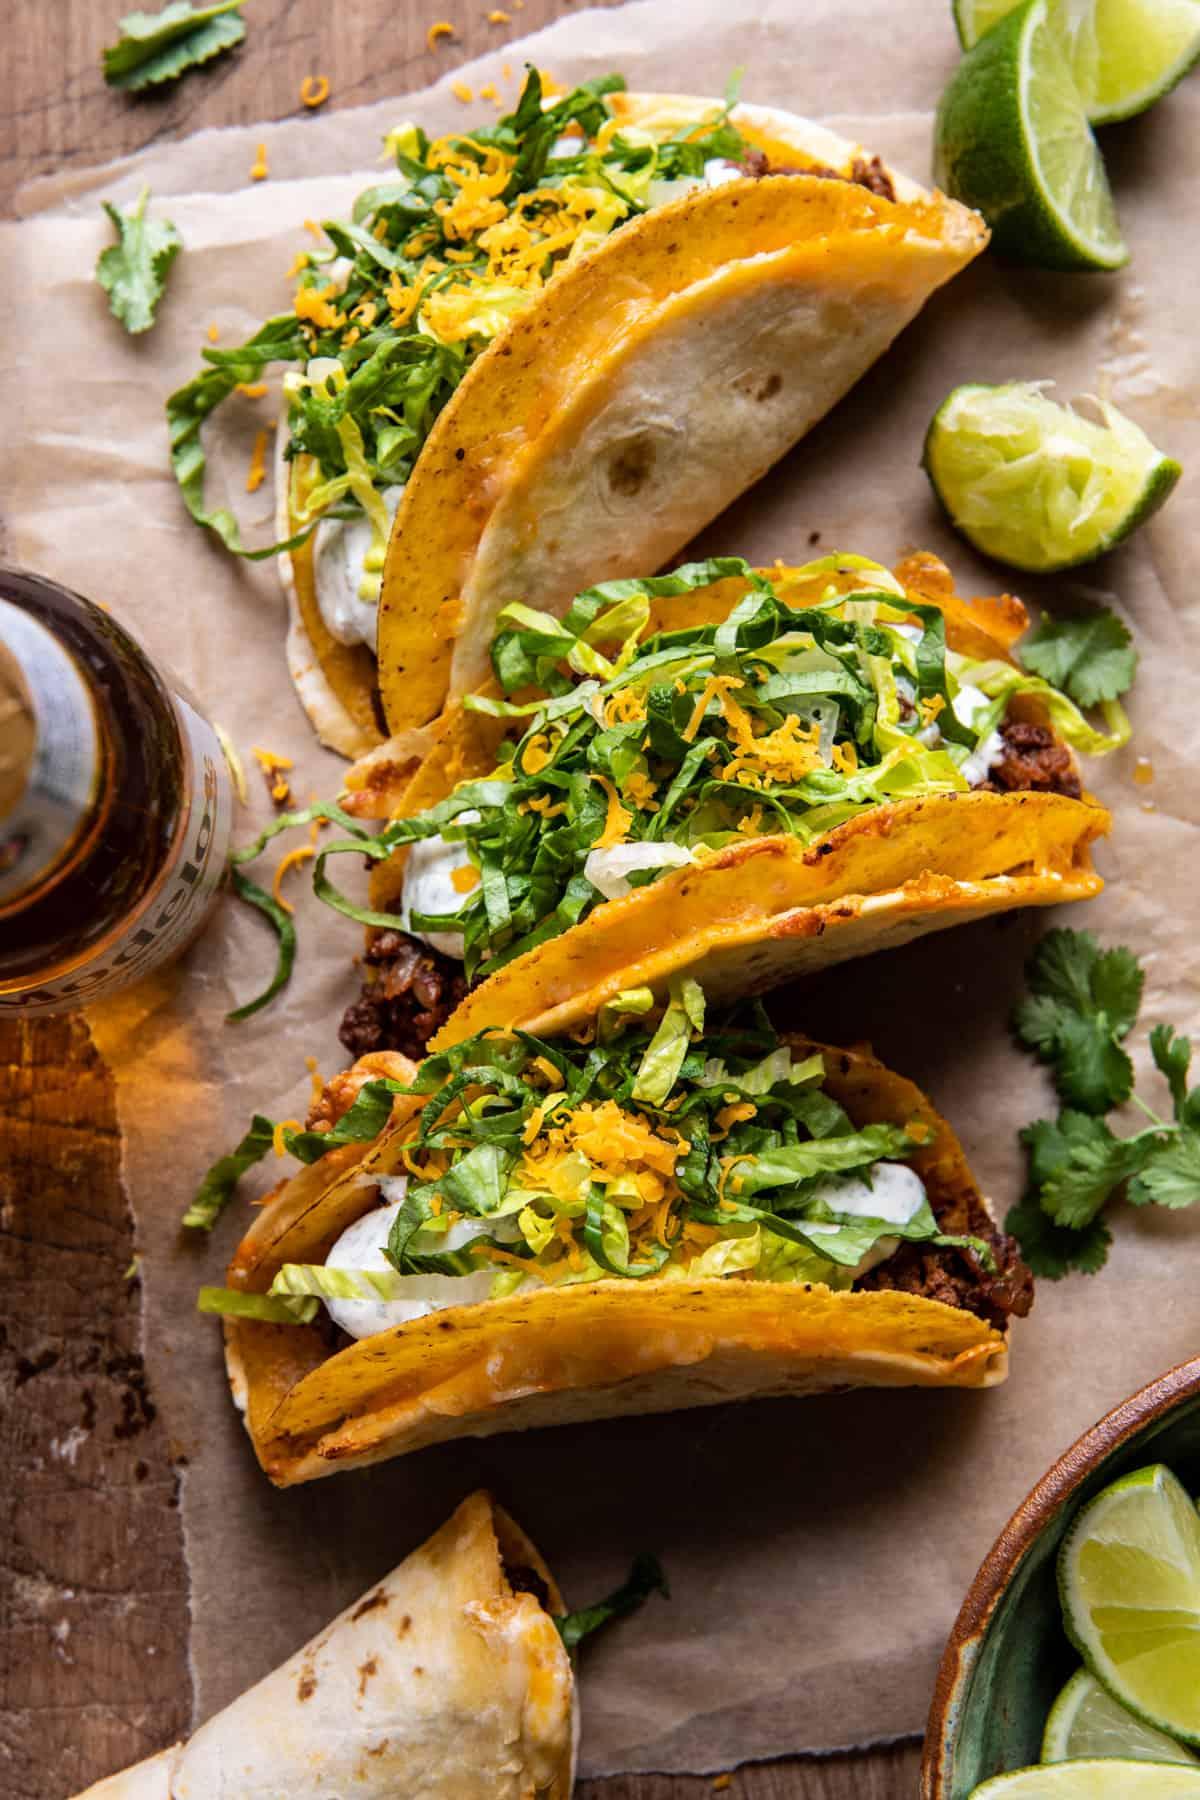 Homemade Cheesy Gordita Crunch Tacos. - Half Baked Harvest Homemade Cheesy Gordita Crunch Tacos.